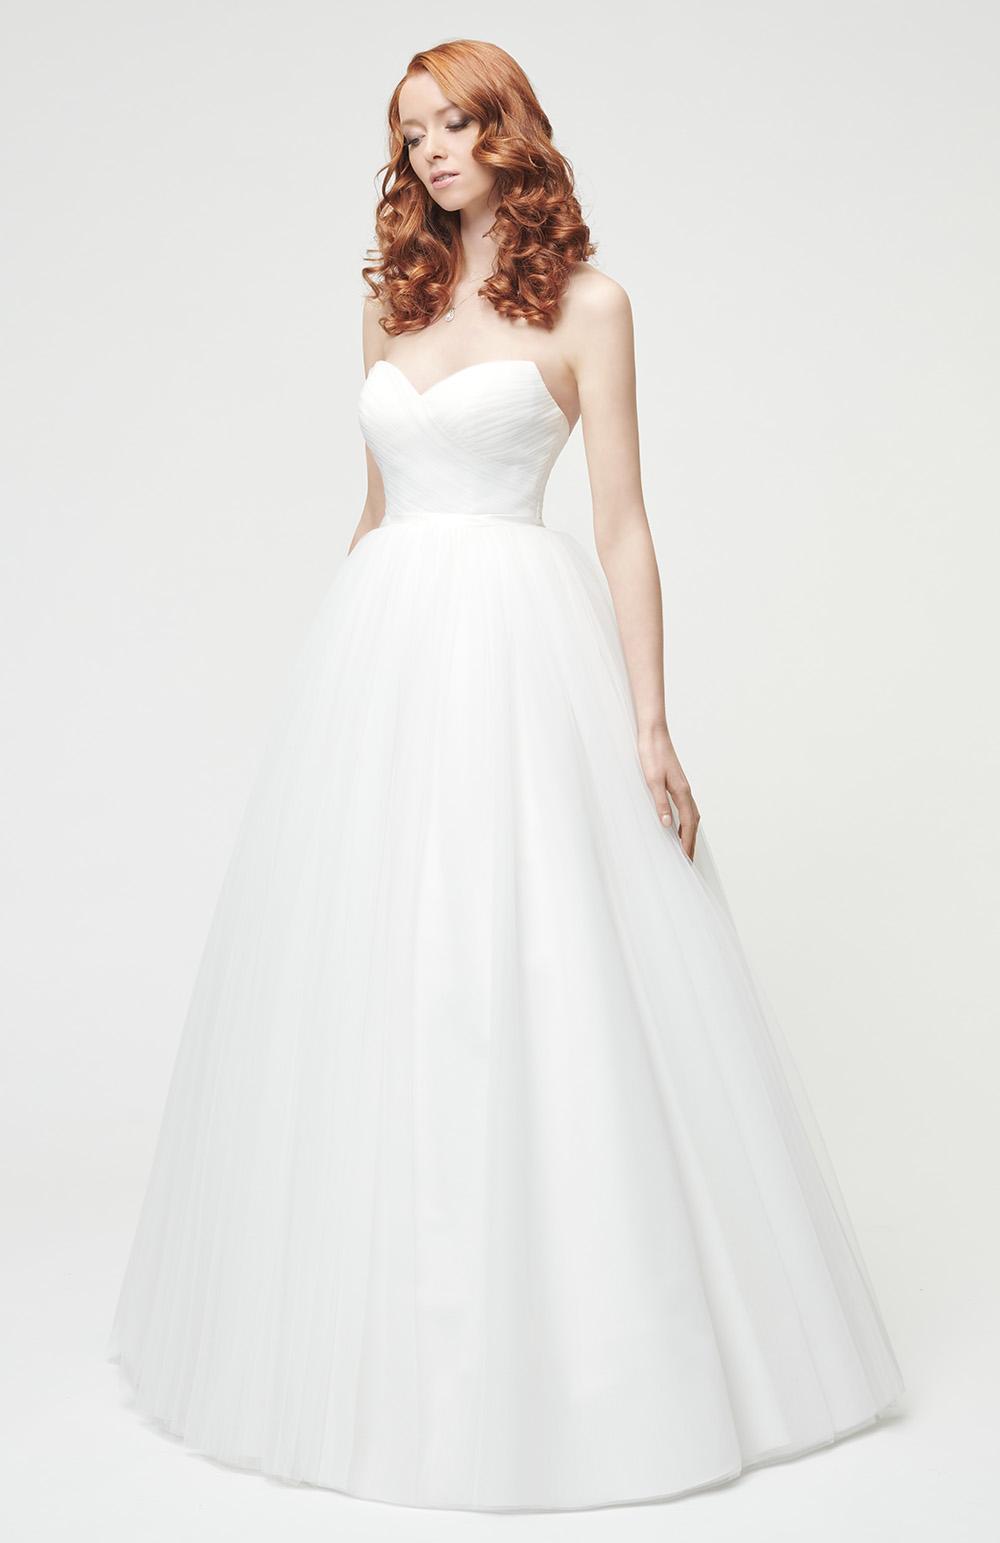 Robe de mariée Modèle Rina